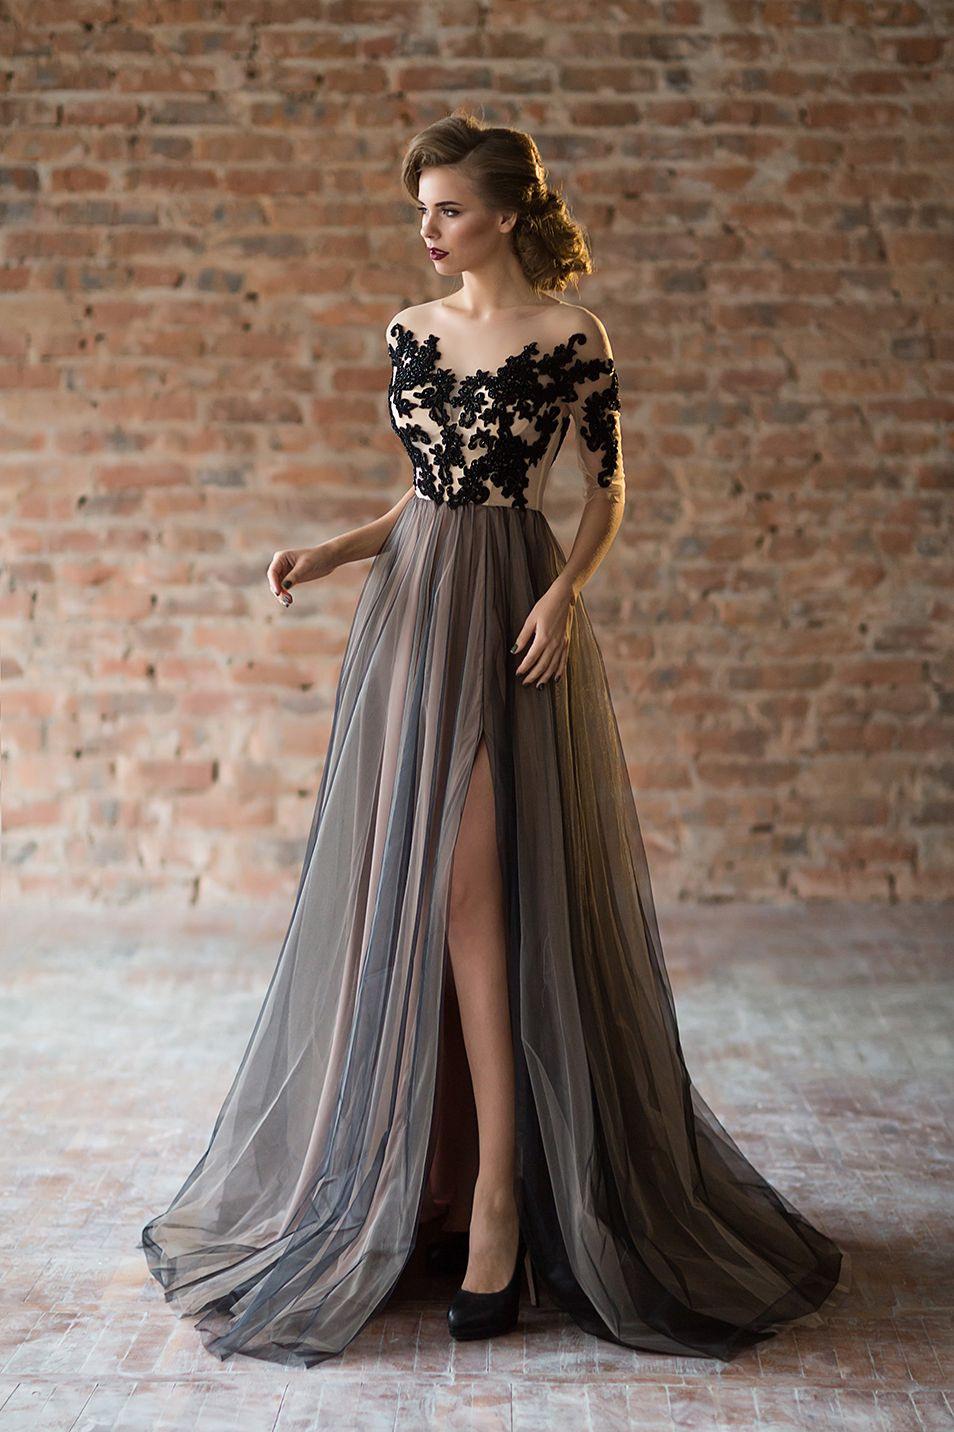 20 Luxus Armani Abendkleid Bester PreisFormal Elegant Armani Abendkleid Galerie